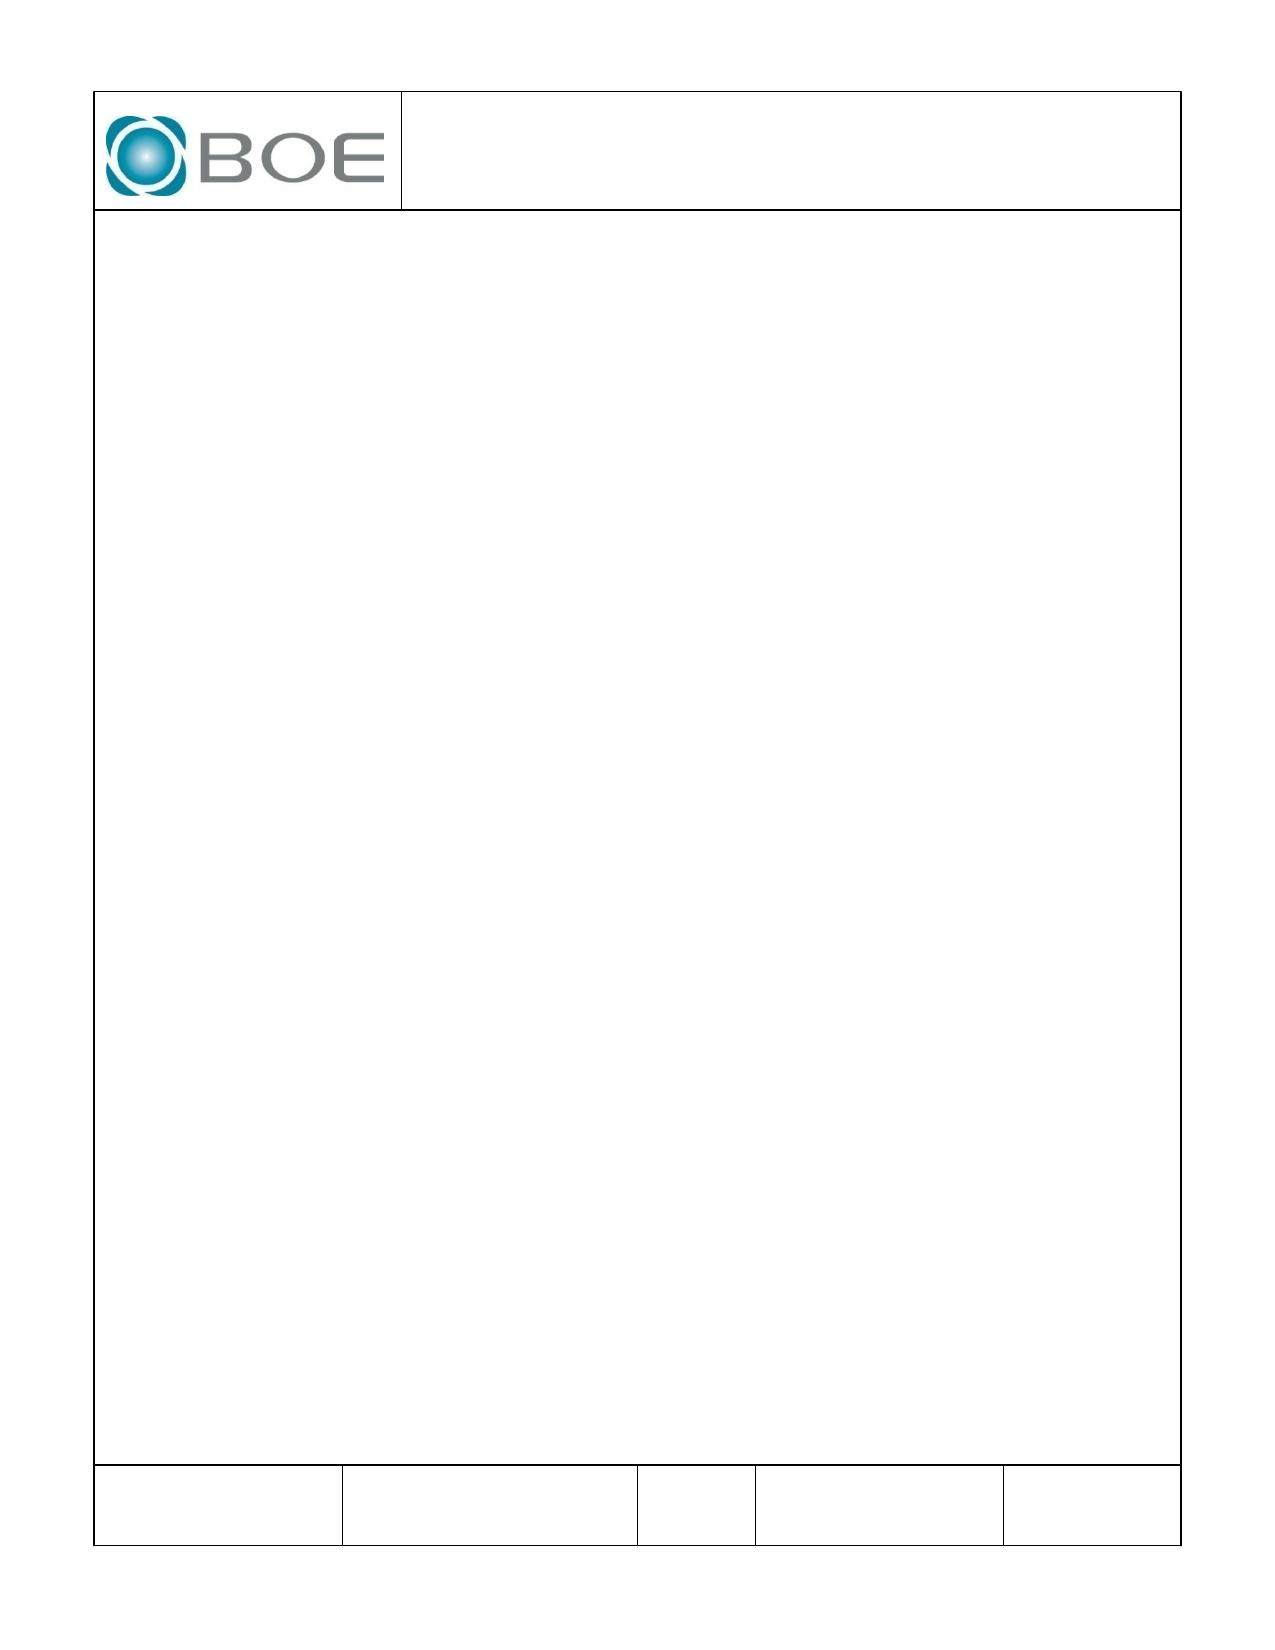 HV121X03-100 Datasheet, HV121X03-100 PDF,ピン配置, 機能